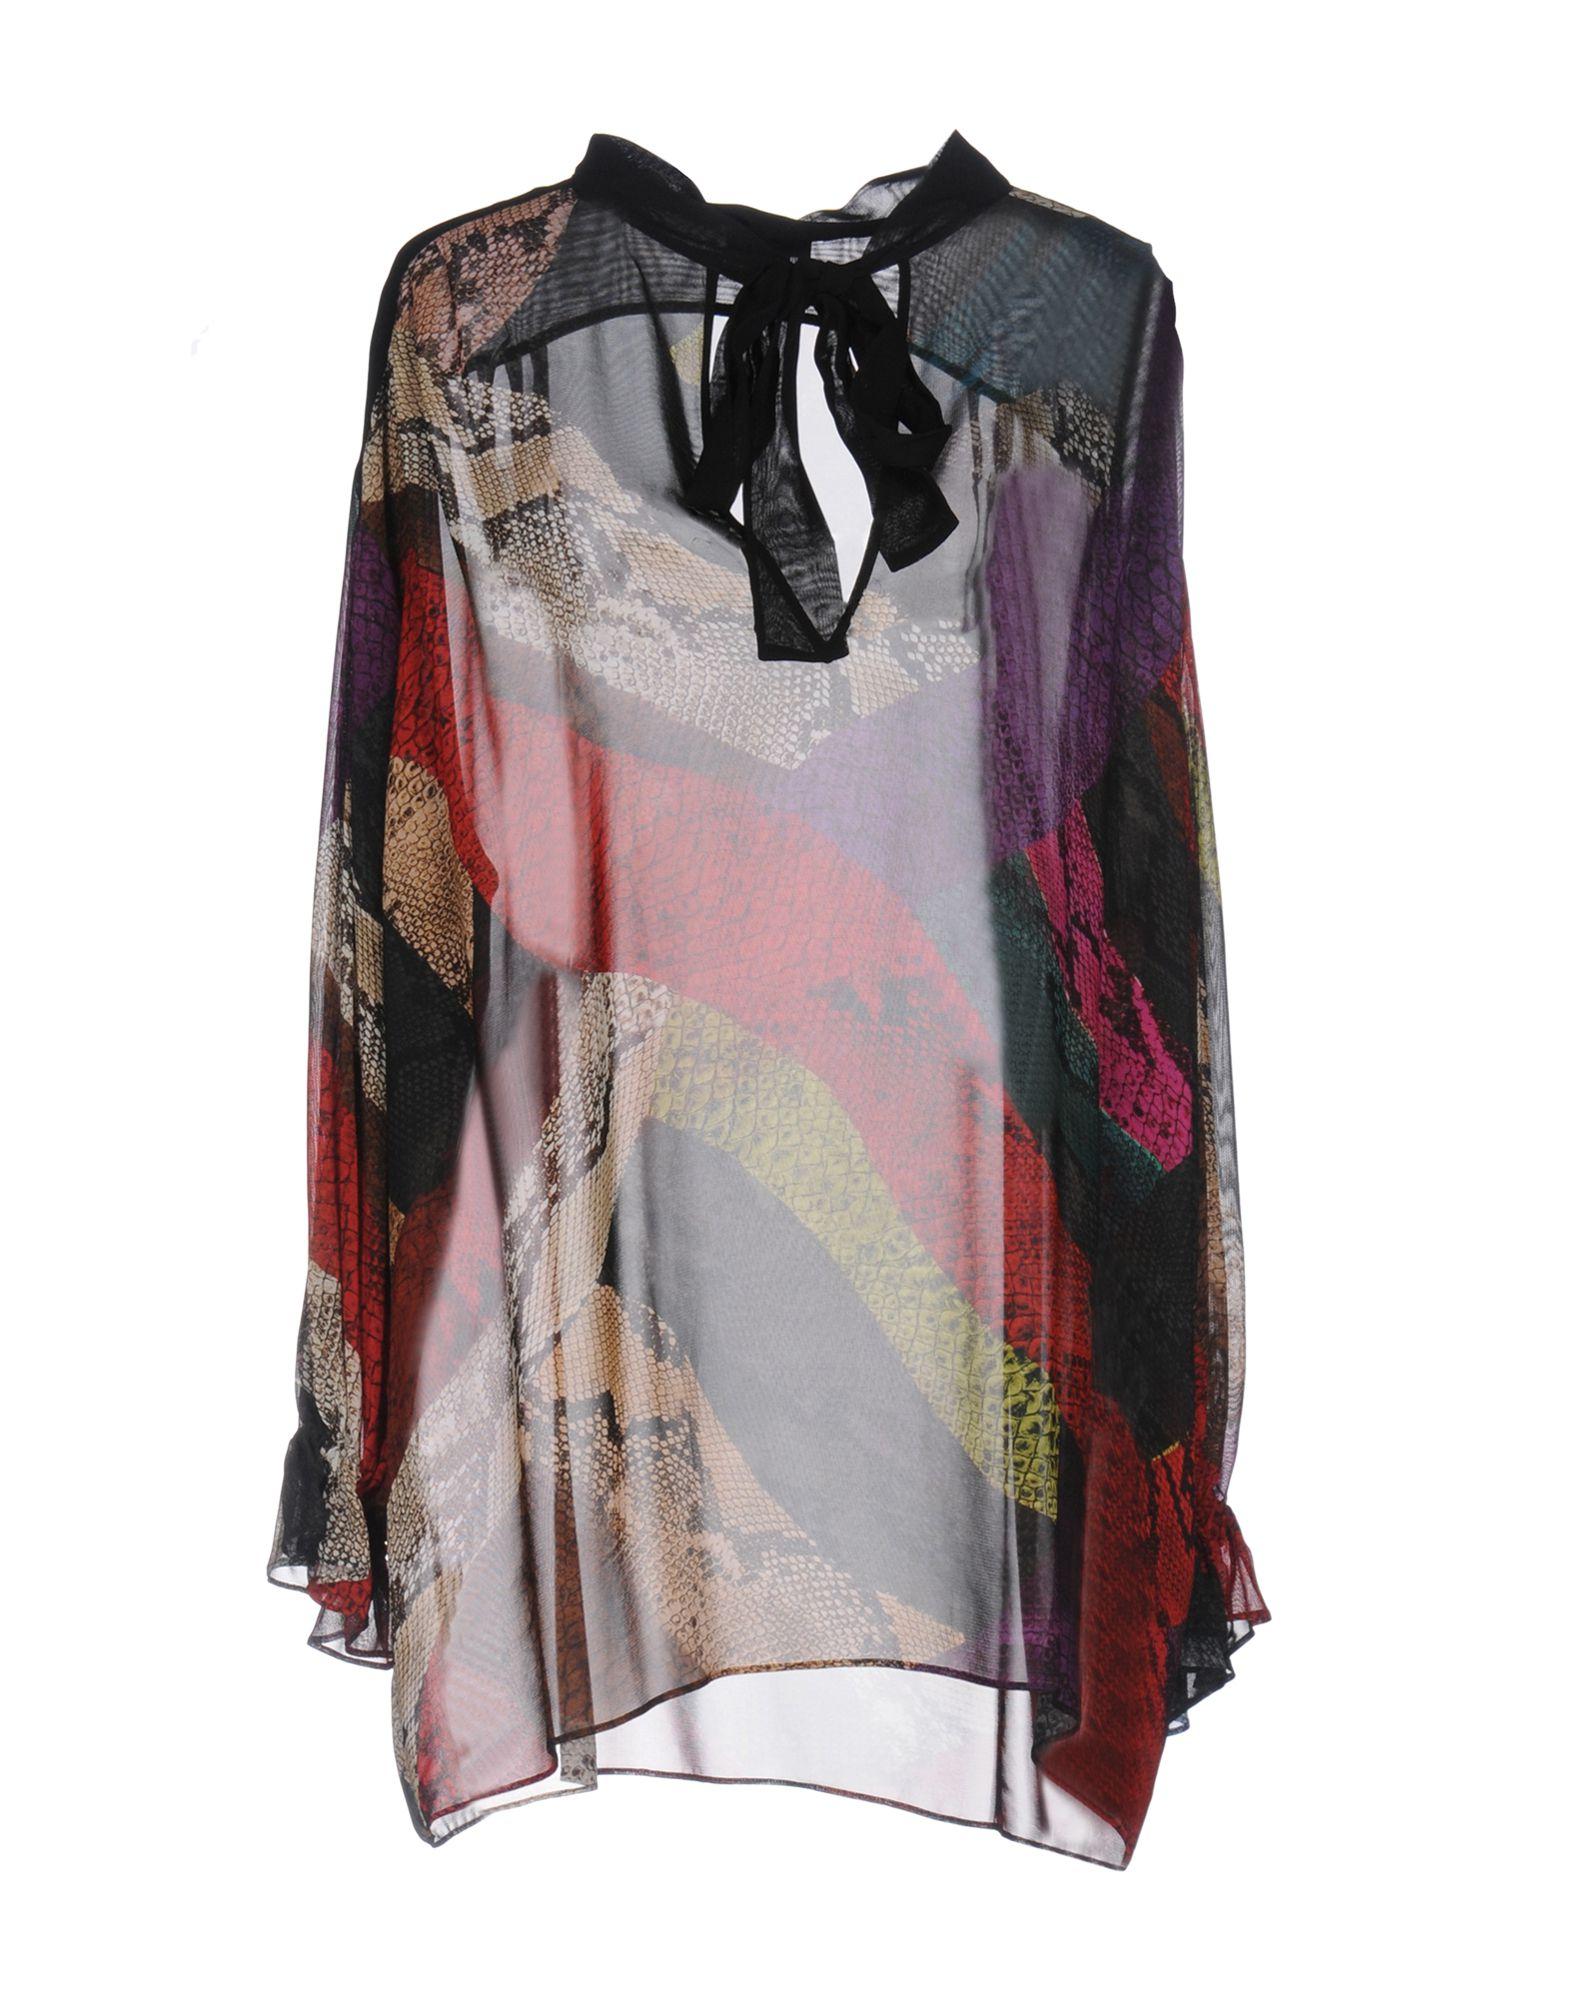 JUST CAVALLI Блузка блузка just cavalli блузка